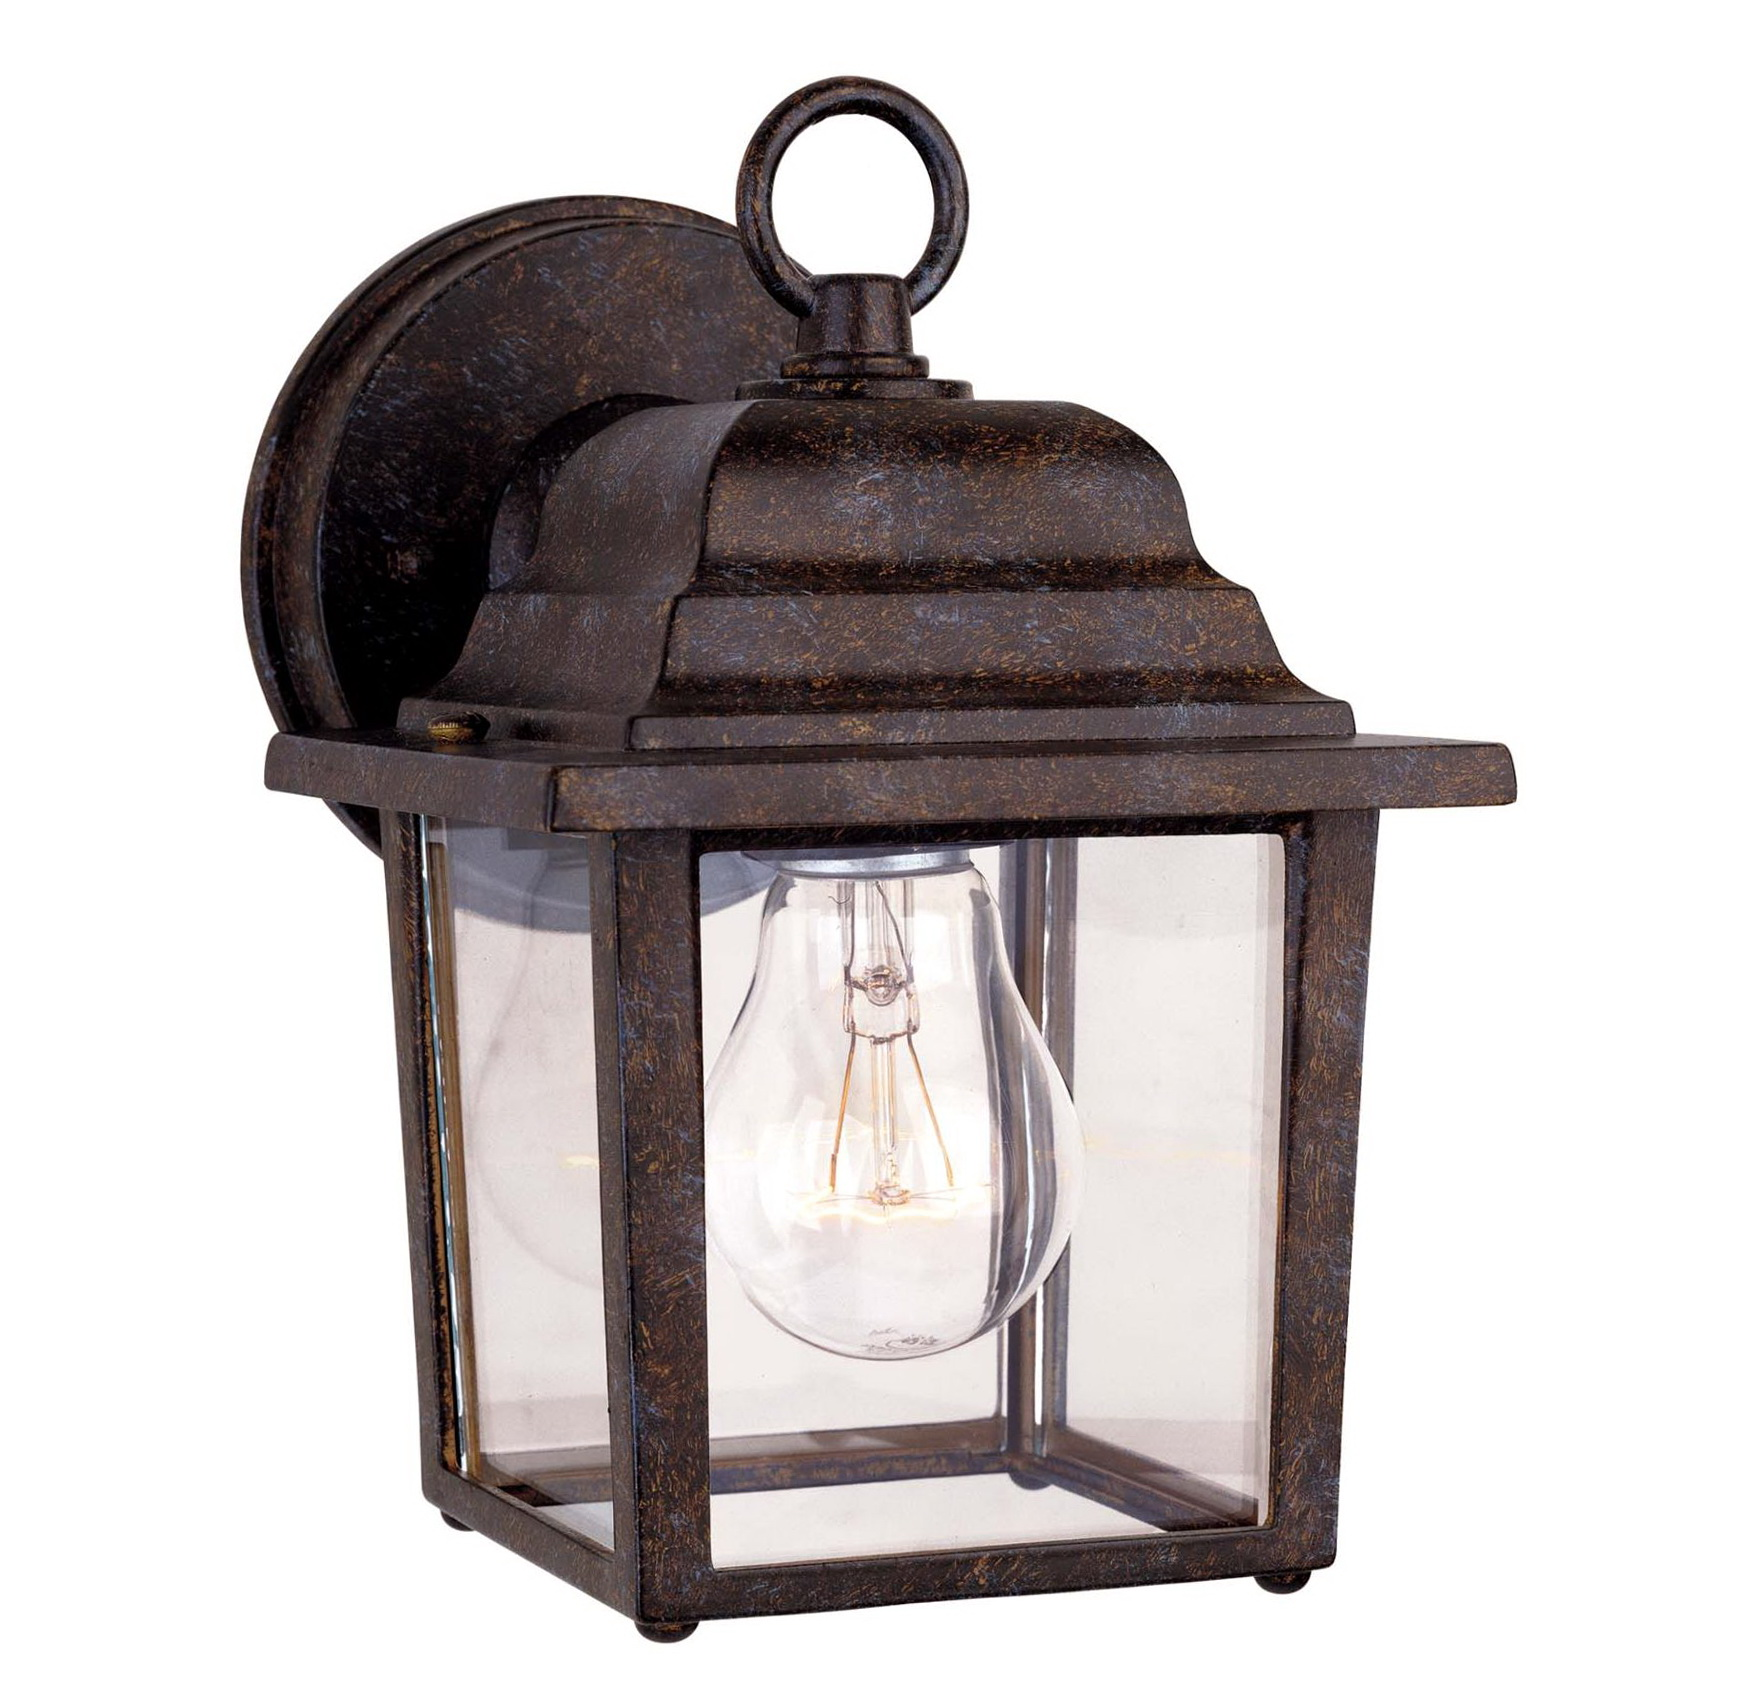 Sconce Lighting Fixtures Home Depot | Home Design Ideas